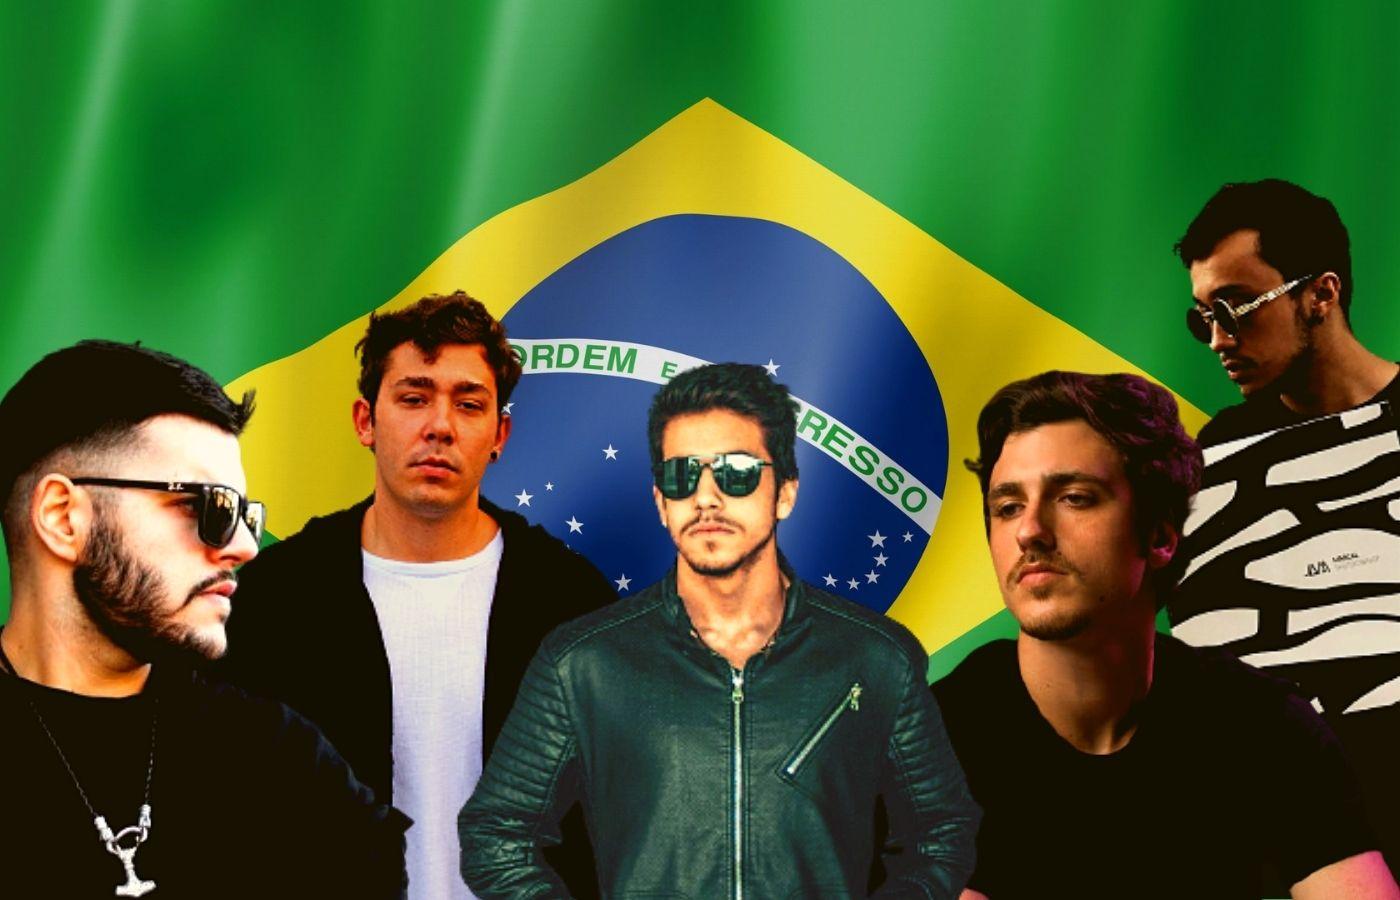 5 talentos ascendentes del techno brasileño que debes conocer